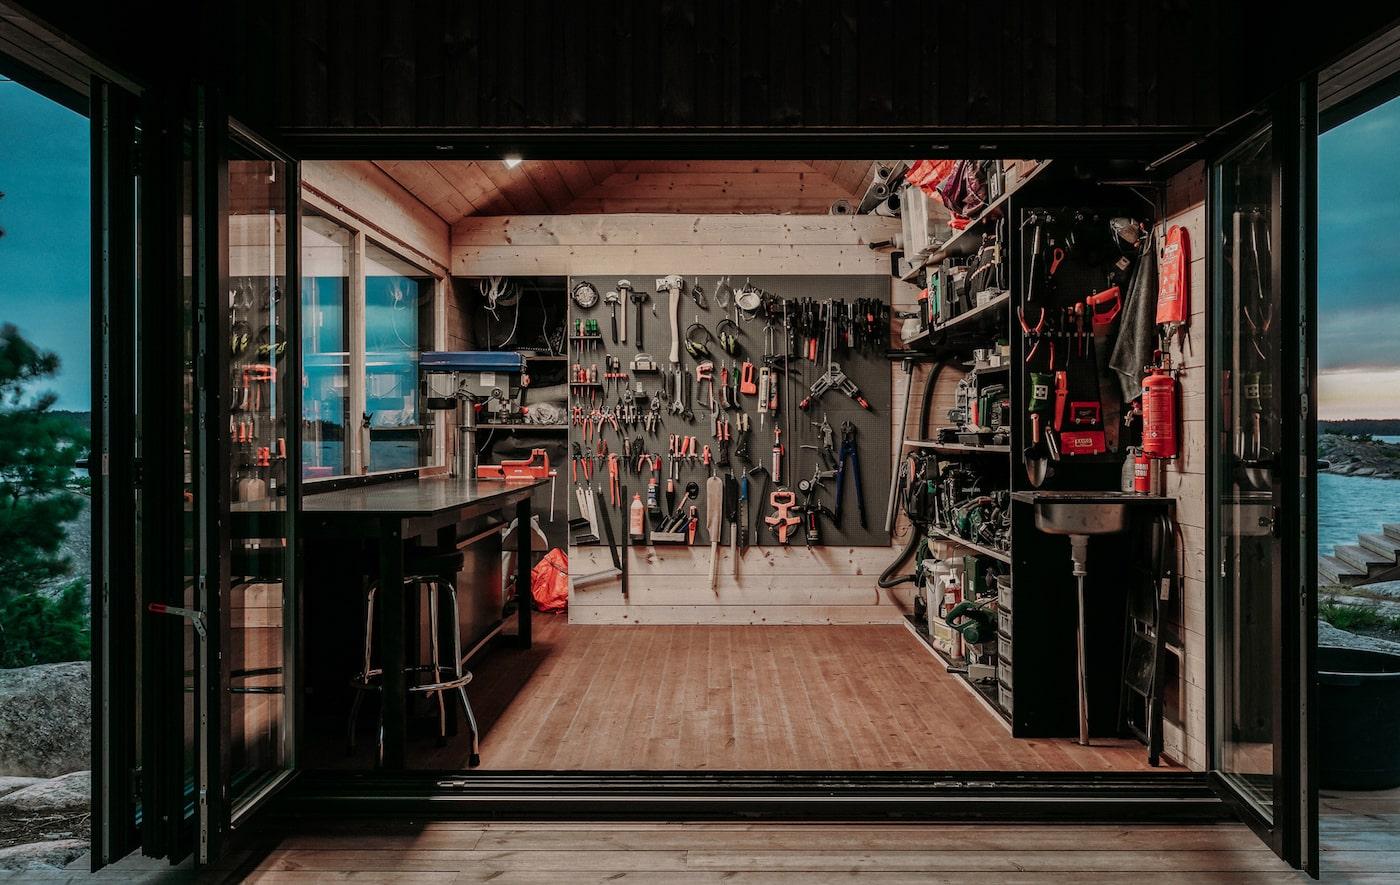 Workshop in off-grid island cabin